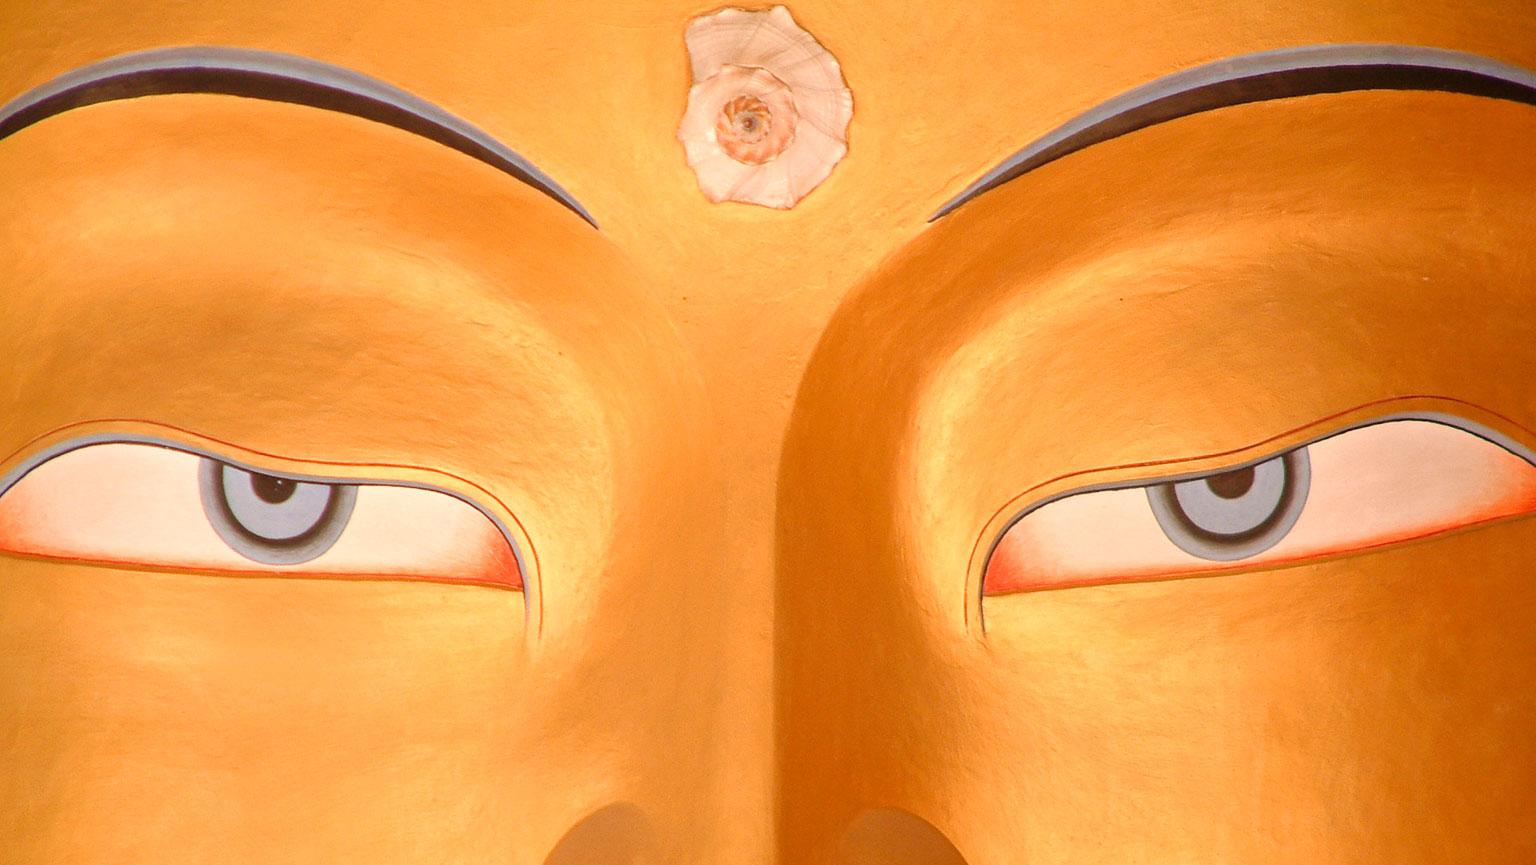 Mahayana Buddhism and the Bodhisattva Ideal